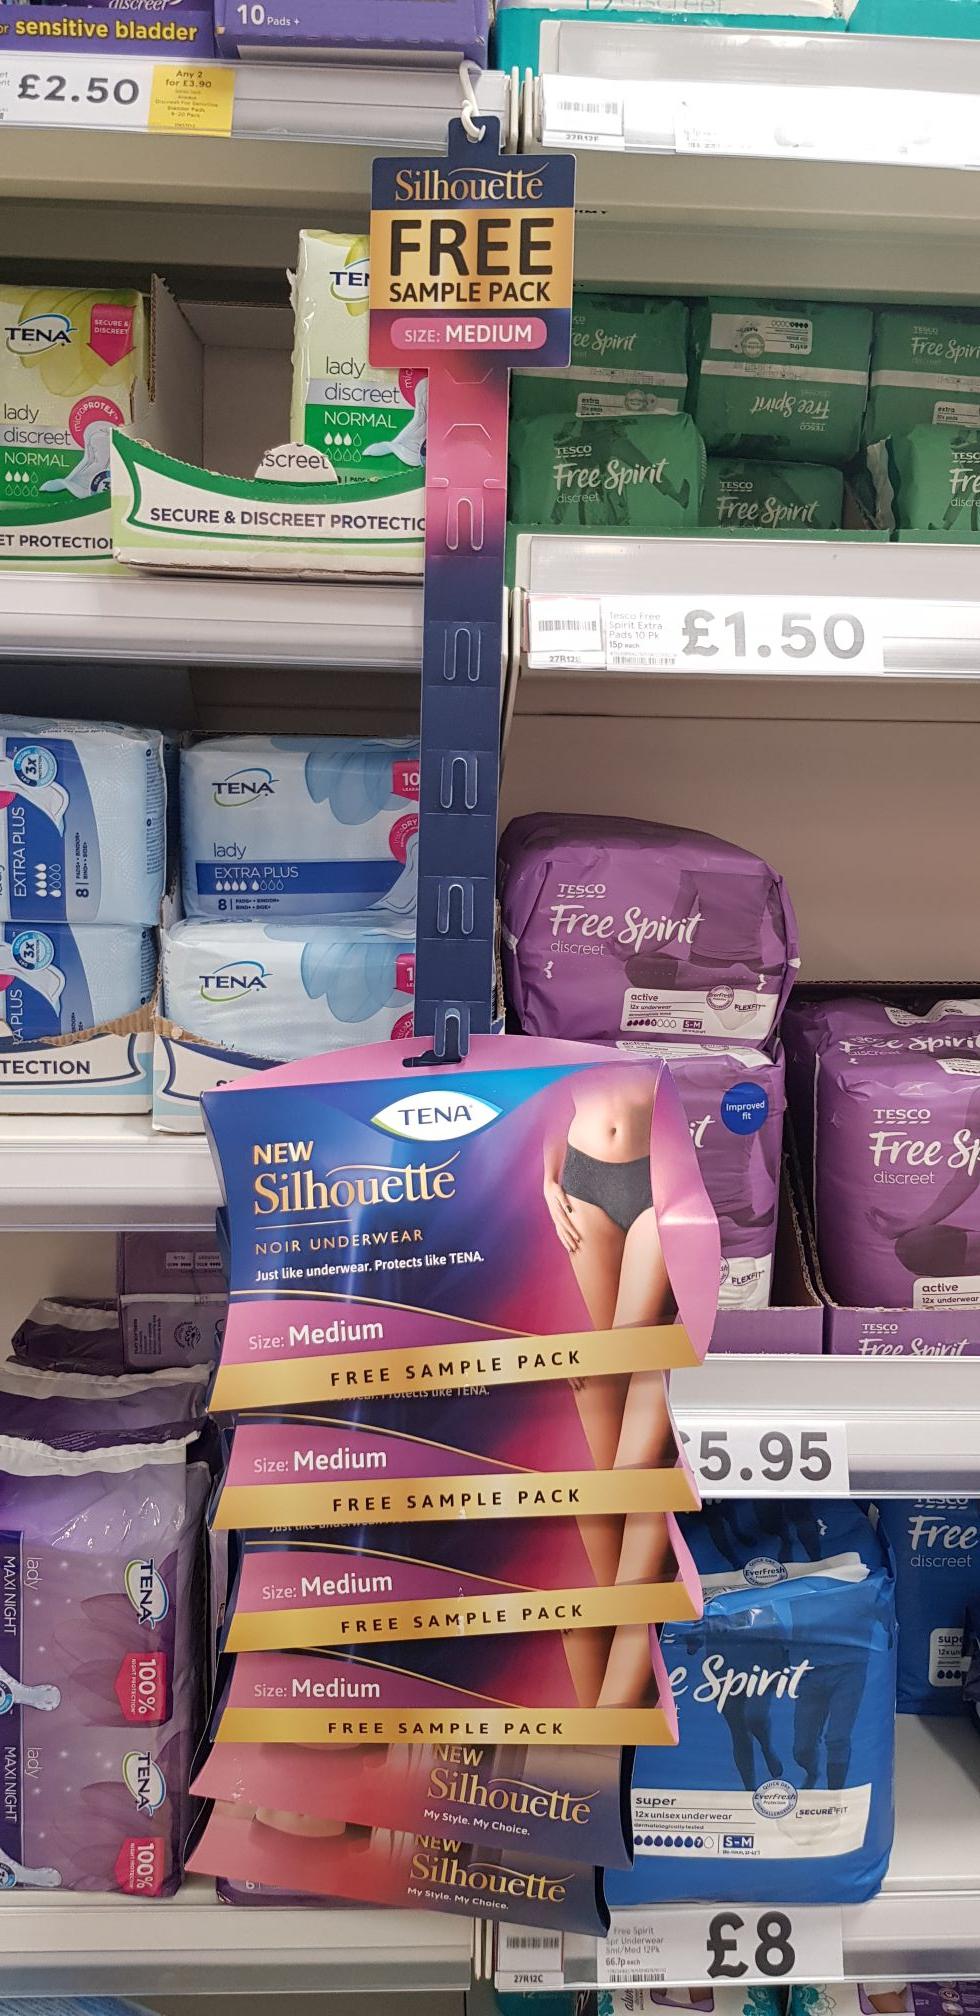 Free sample pack of Tena Silhouette medium size underwear in Tesco